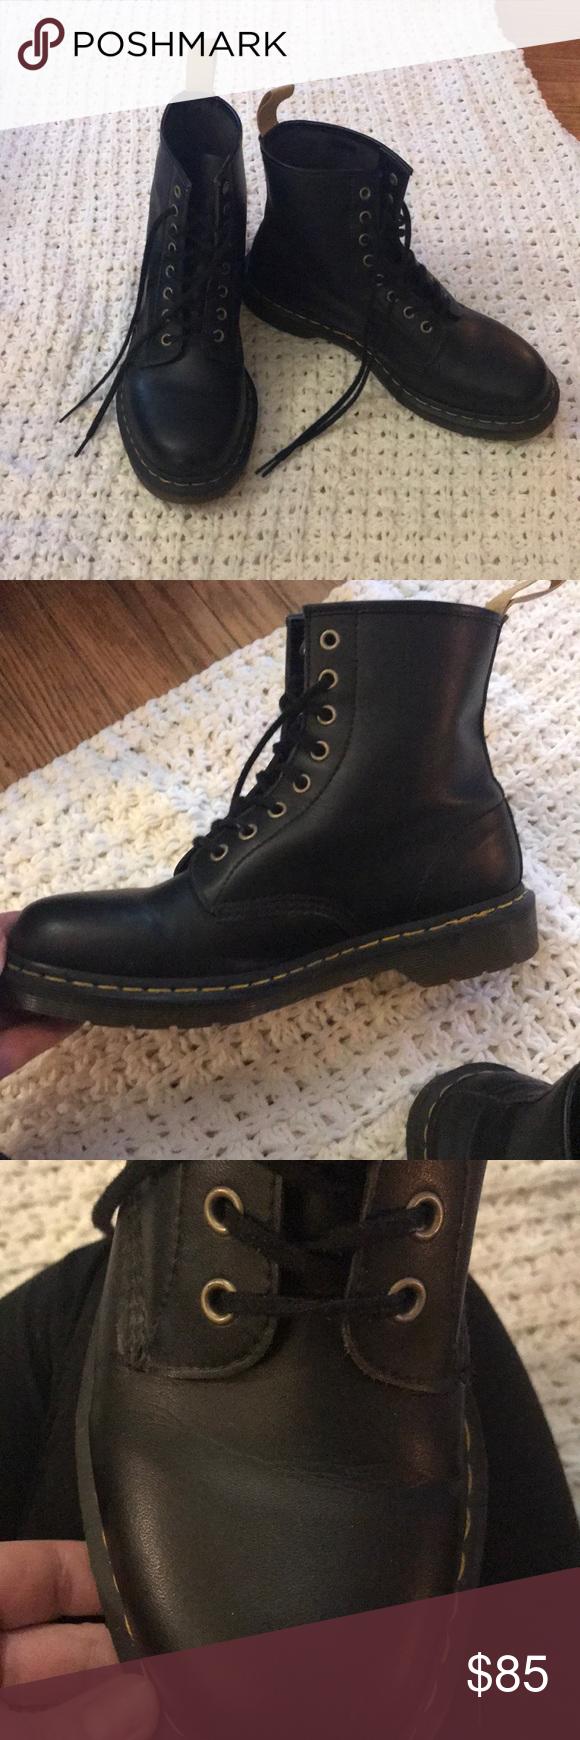 Dr. Martens vegan 1460 combat boot size